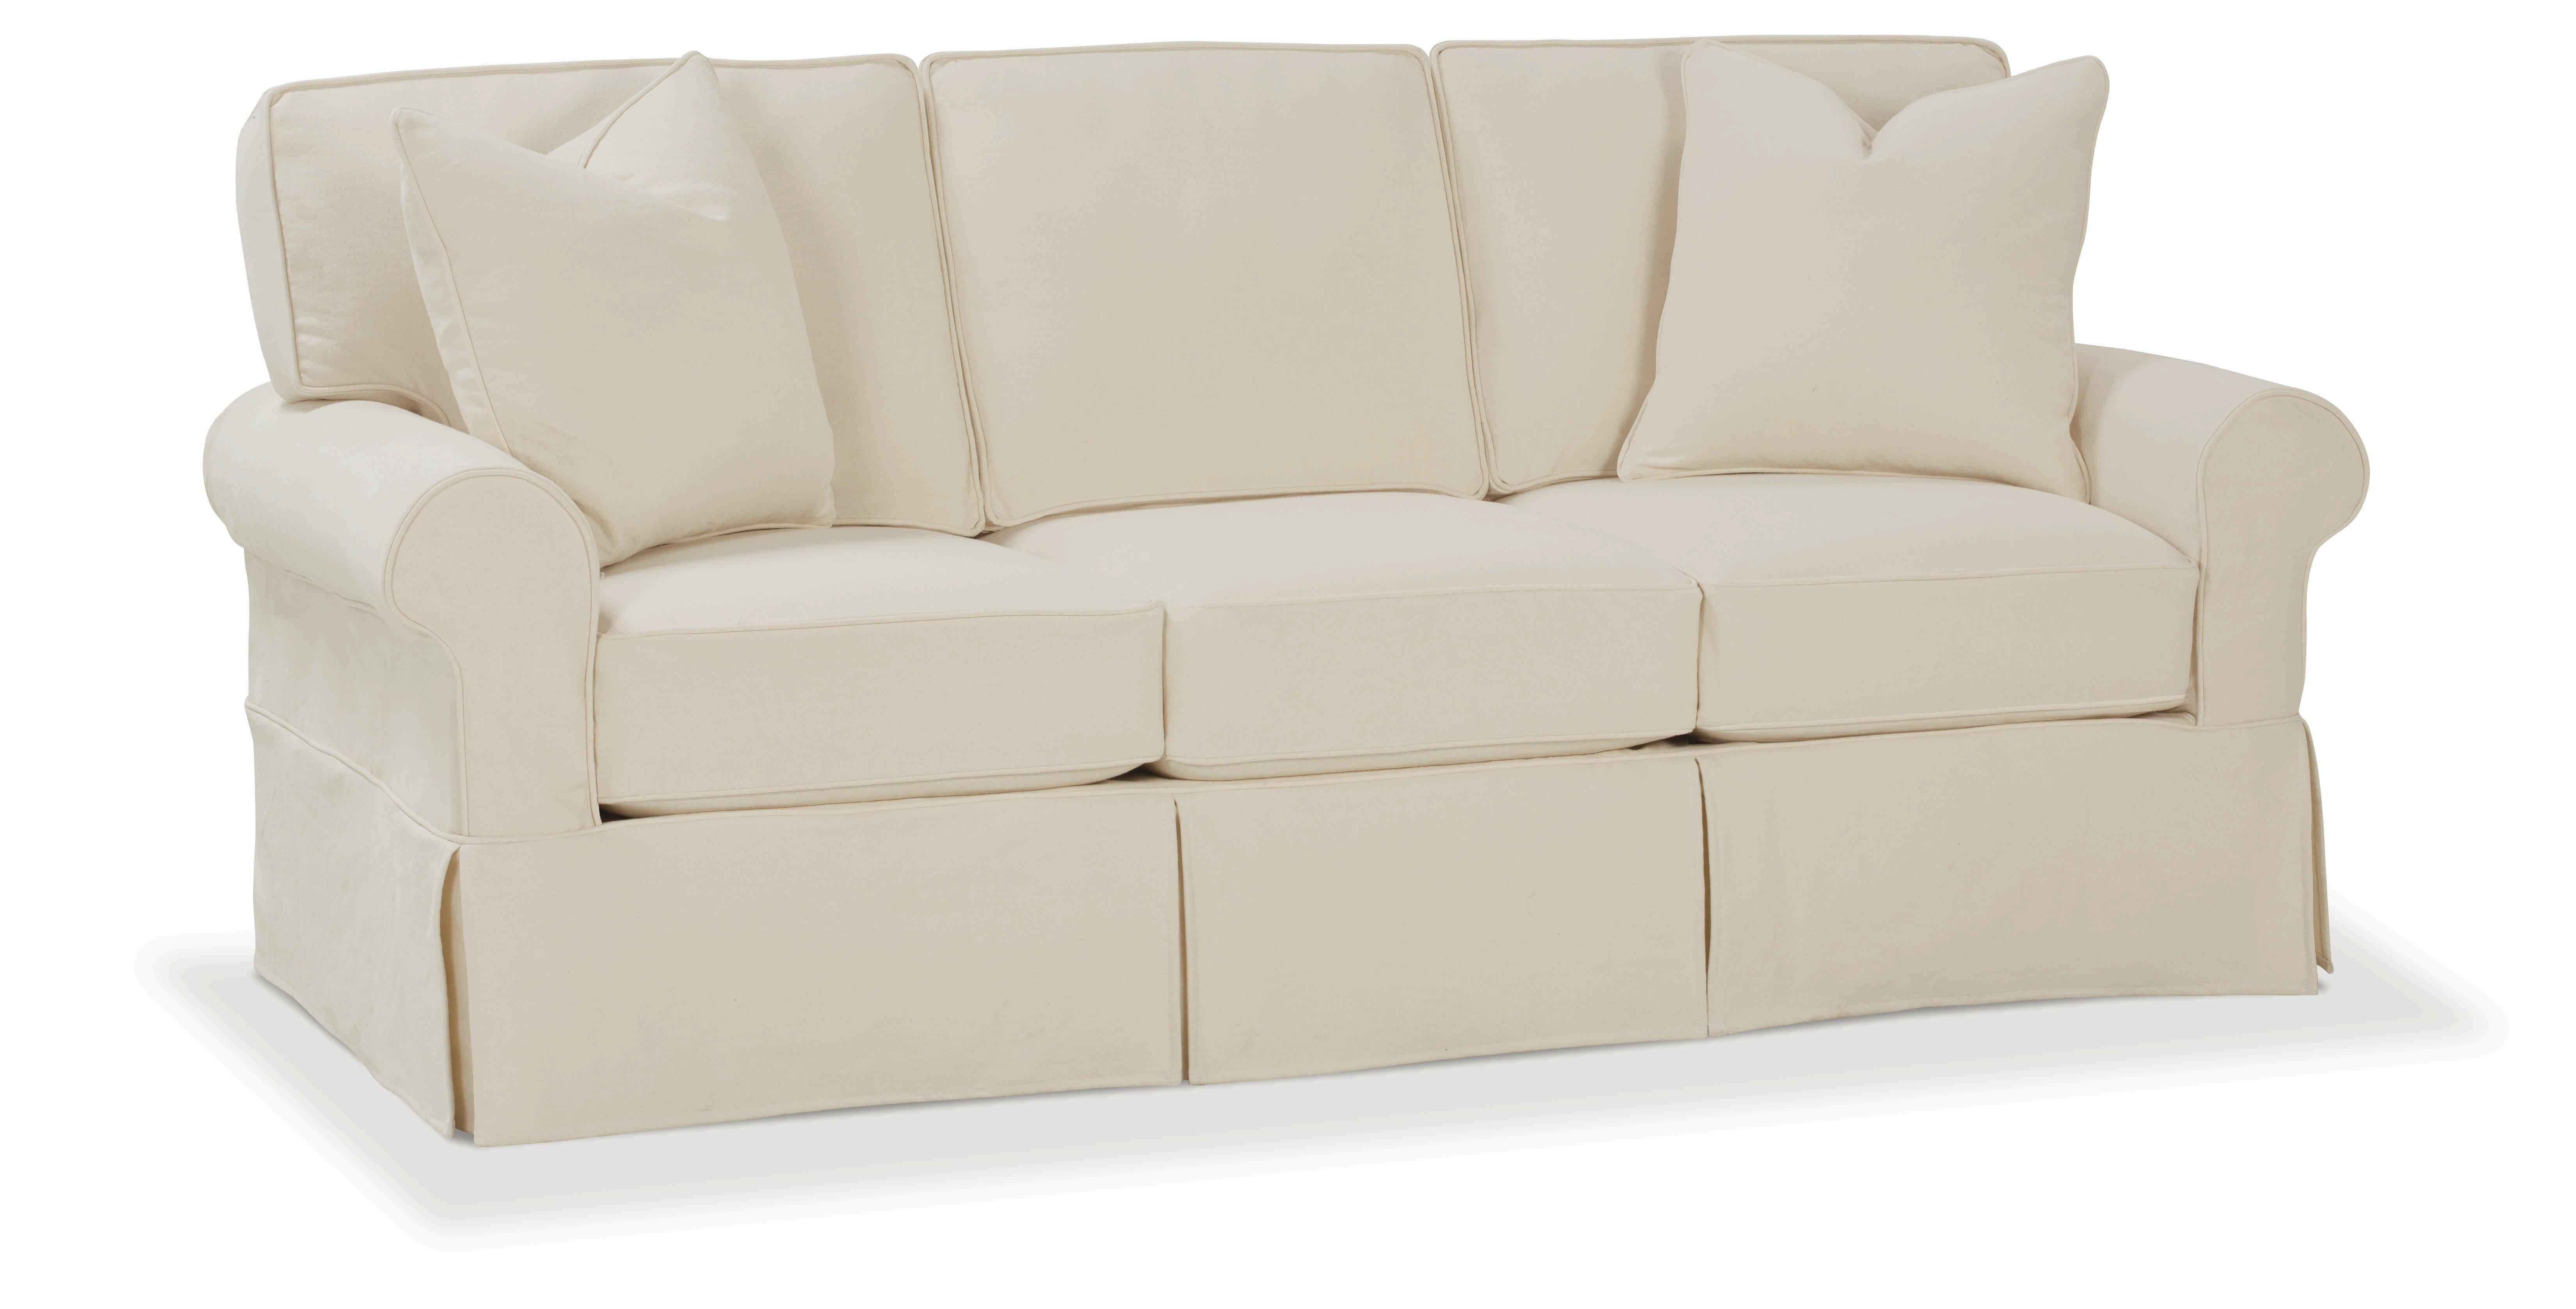 Rowe Furniture Wayfair Sectionals From Hub Company Portland Maine Sleeper